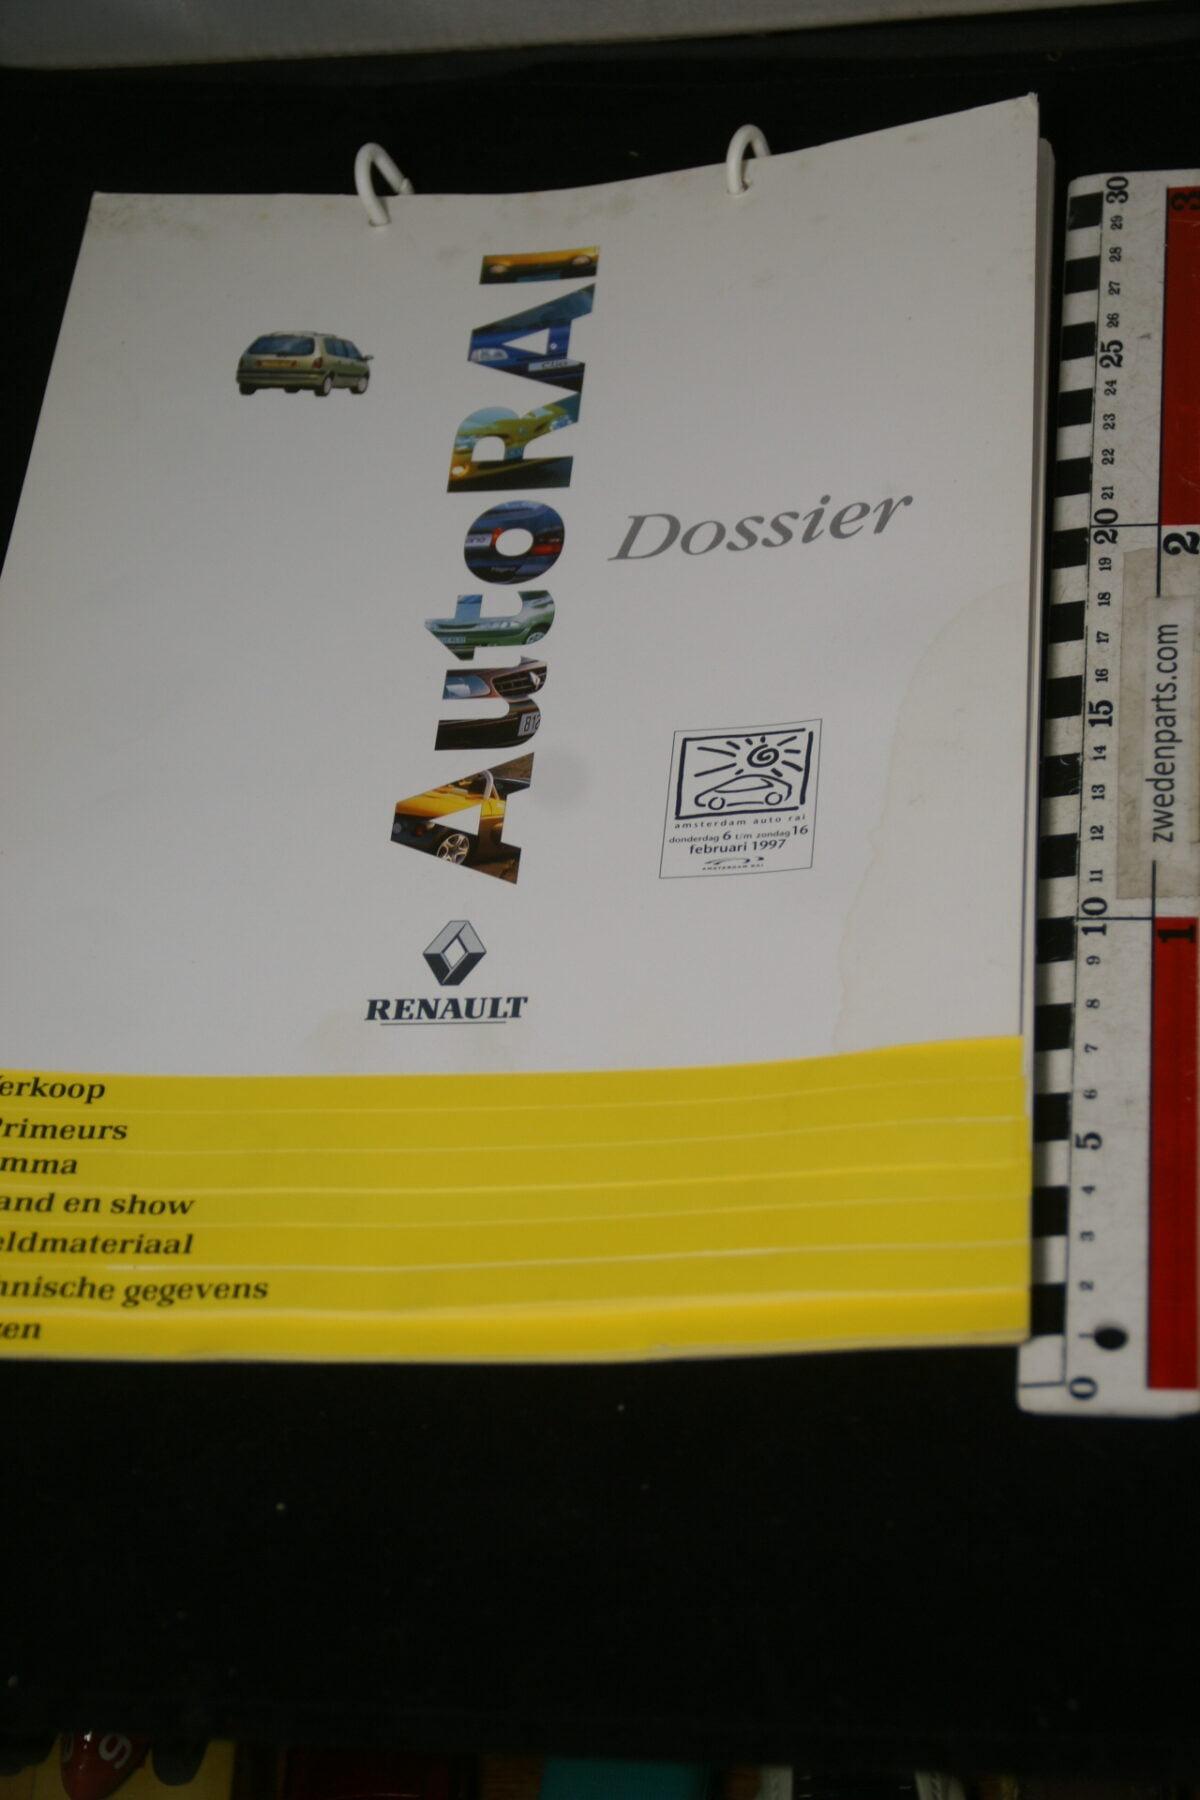 DSC09979 1997 originele persmap Renault AutoRAI-b14b7433